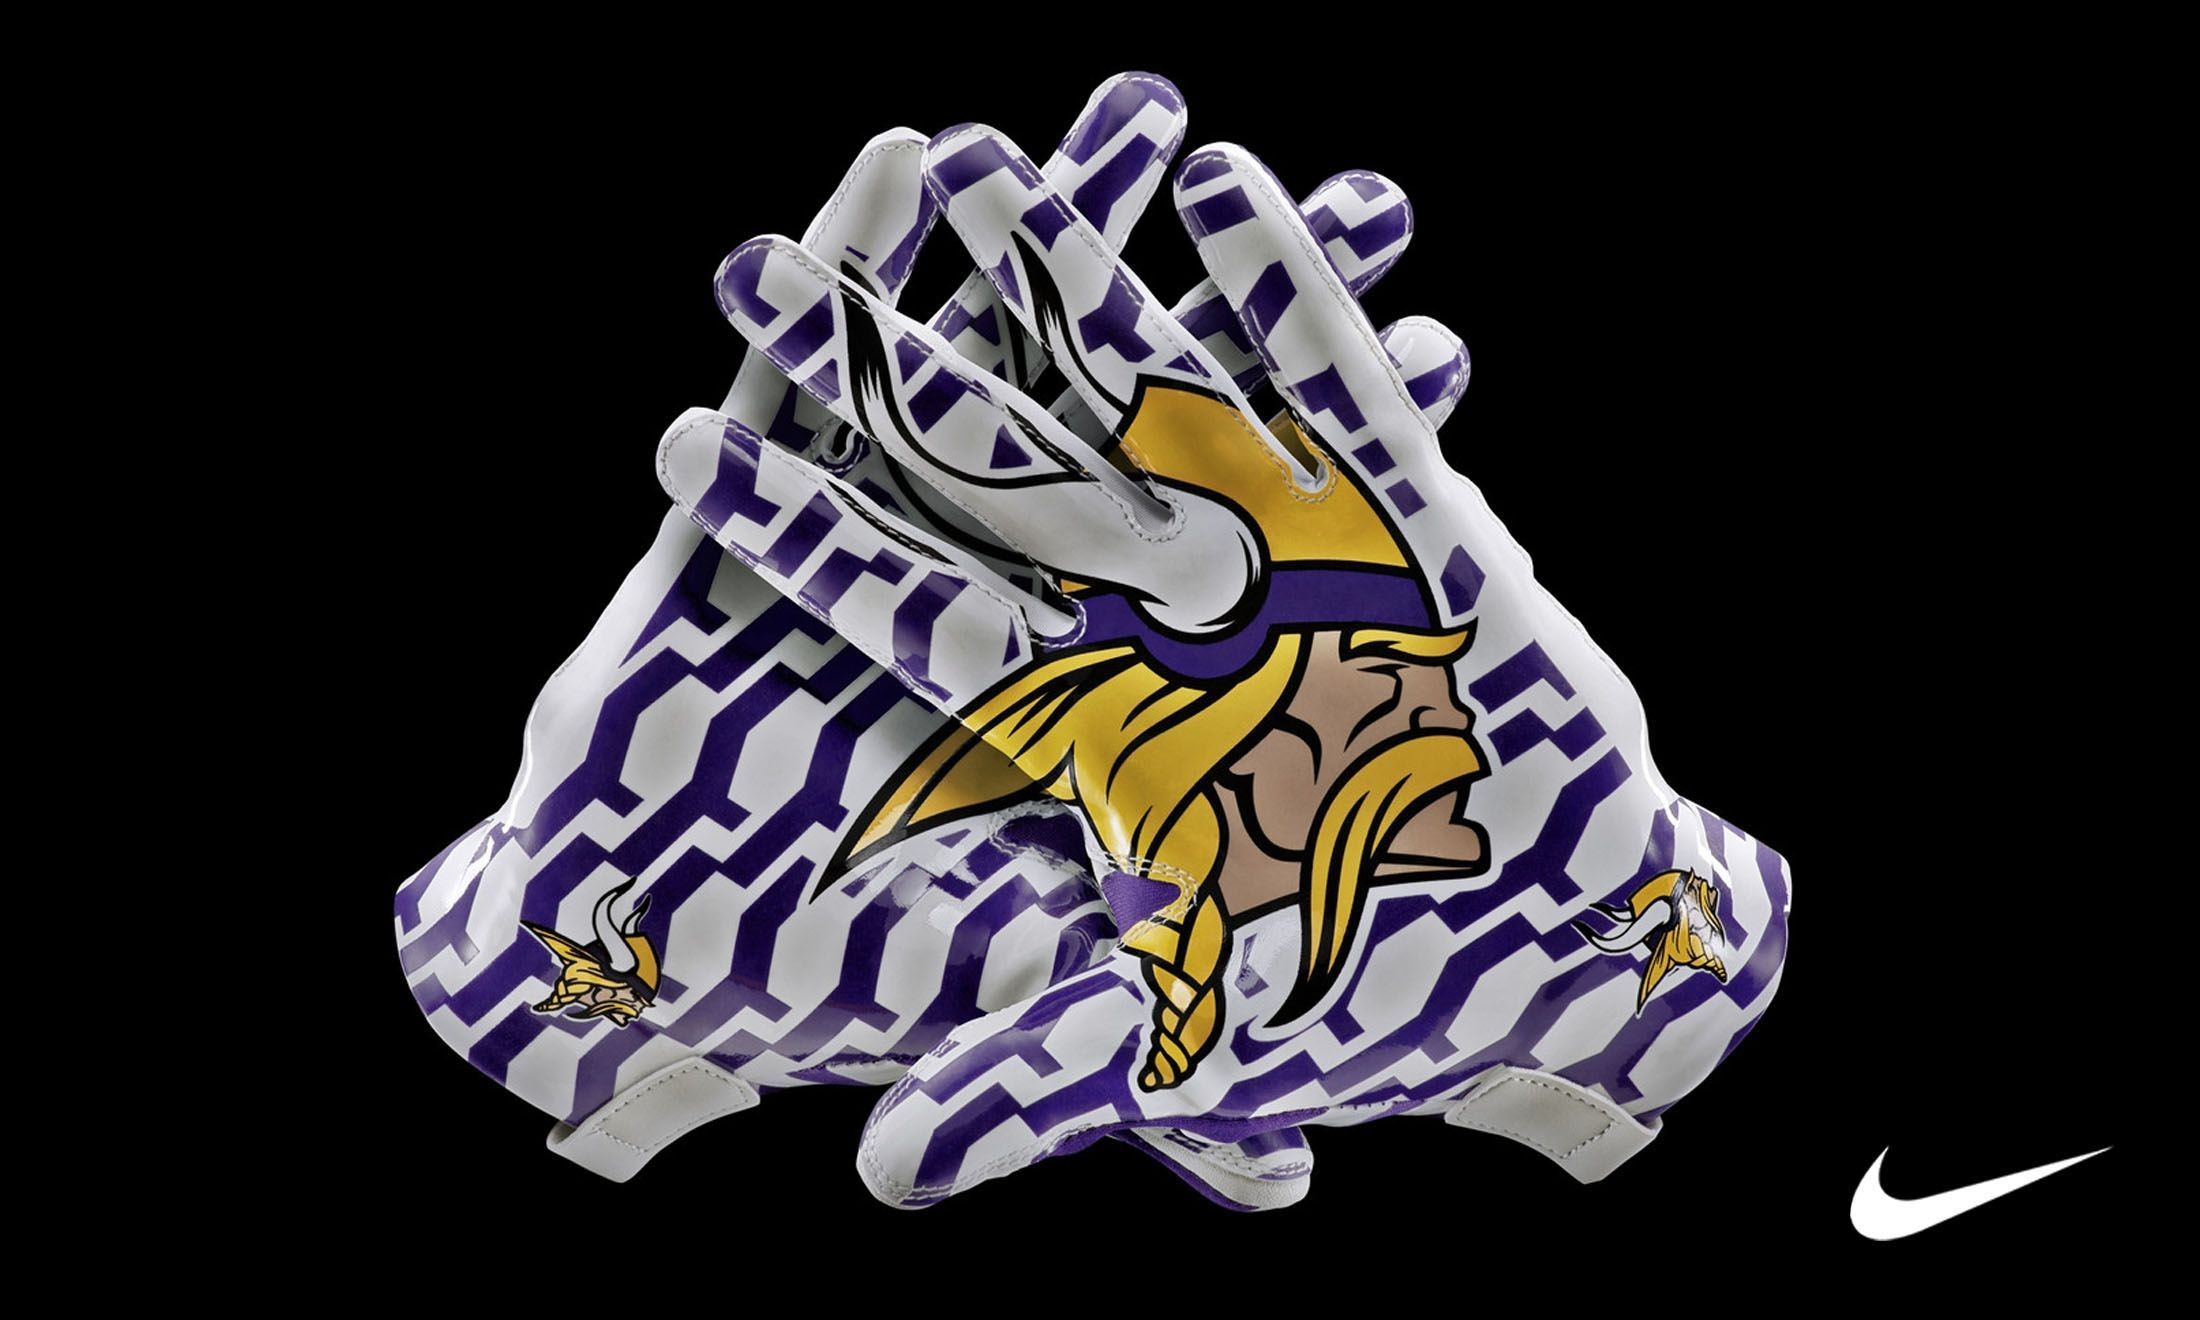 Minnesota Vikings Pics. 0.204 MB